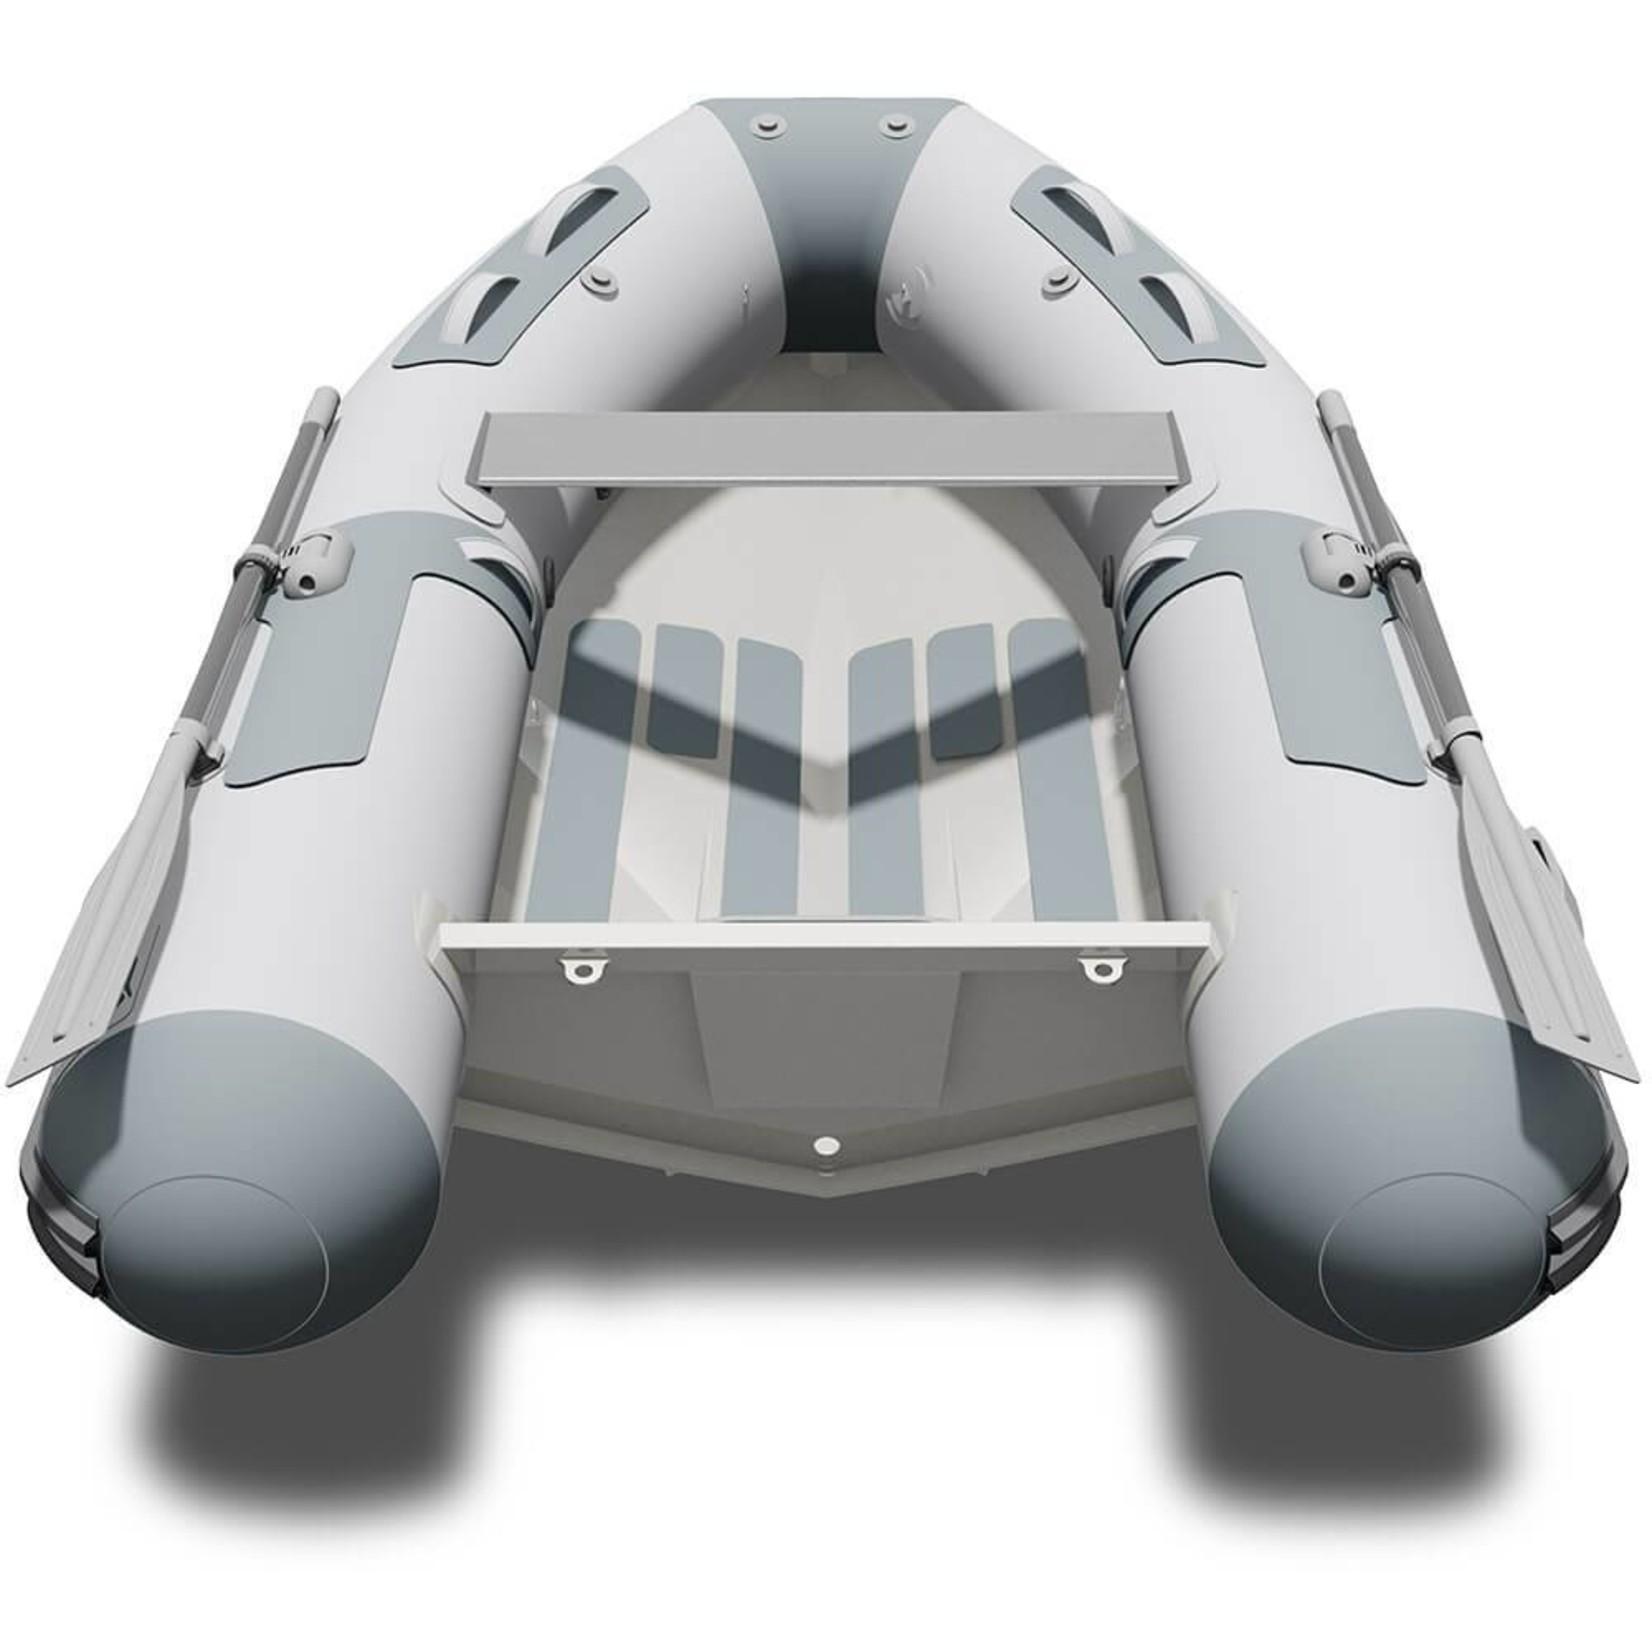 Zodiac Cadet 270 ALU RIB - single deck 02.73 m)